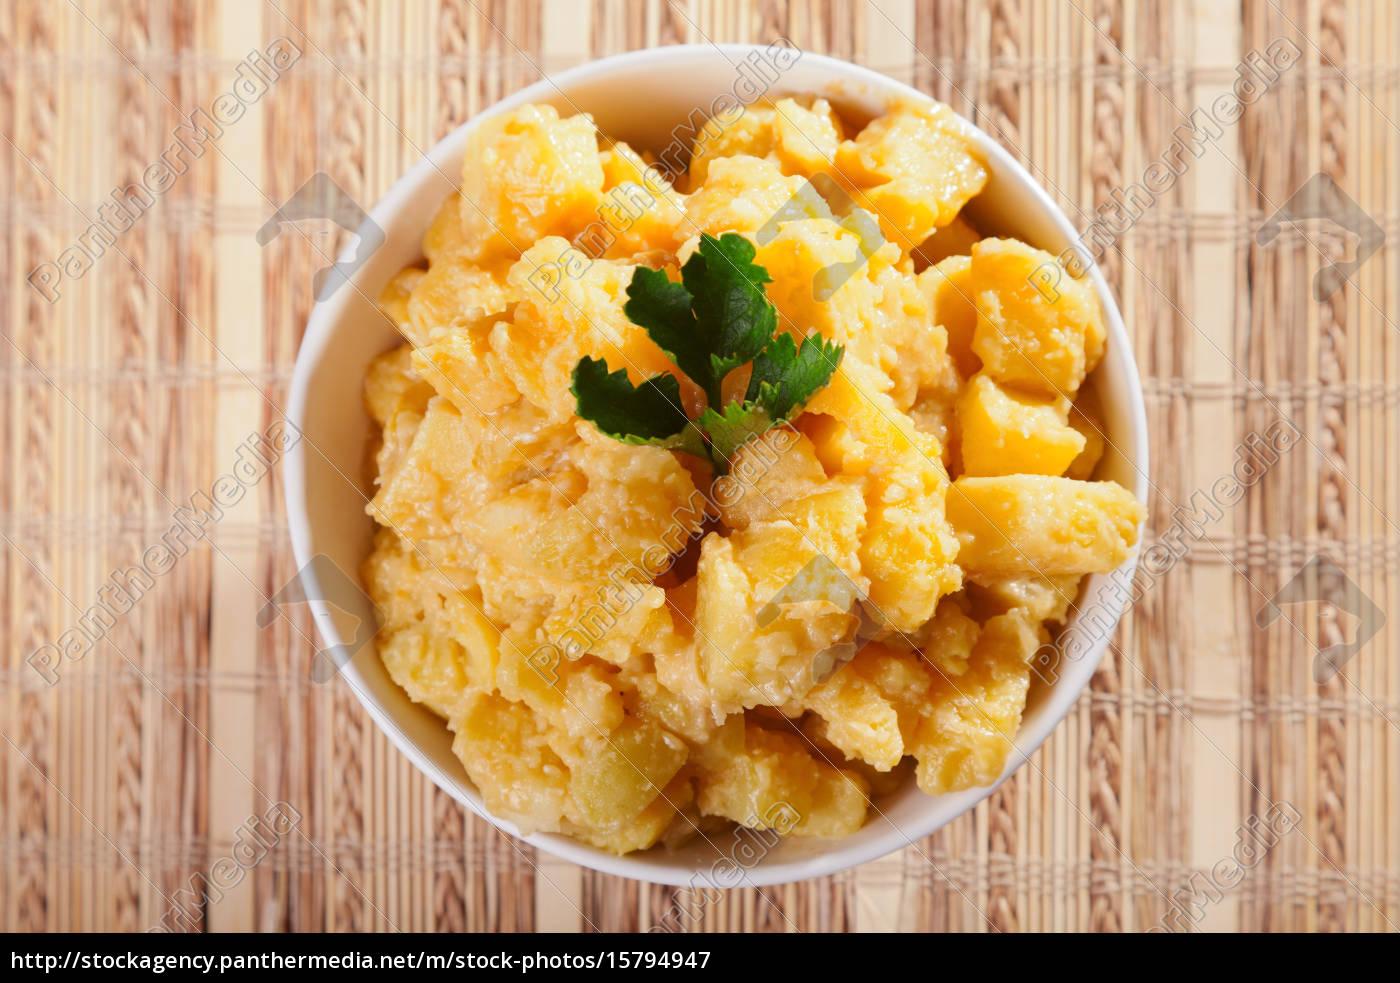 boiled, potato, salad, boiled, potato, salad, boiled, potato - 15794947